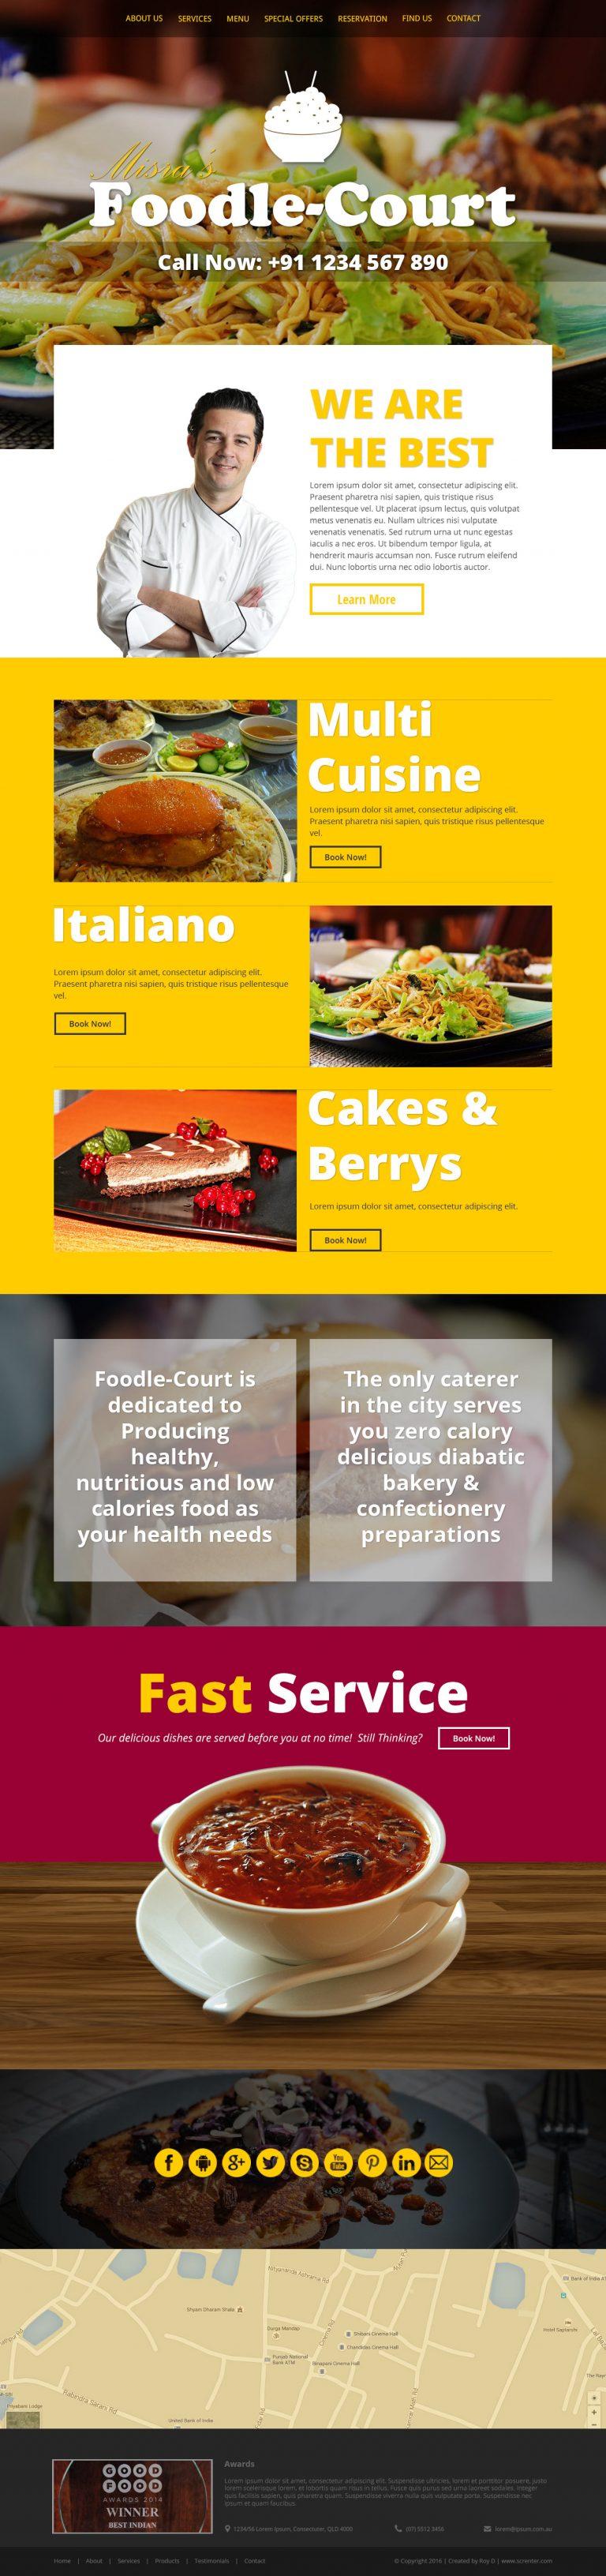 foodle-court-a-multi-cuisine-restaurant-bootstrap-responsive-website-psd